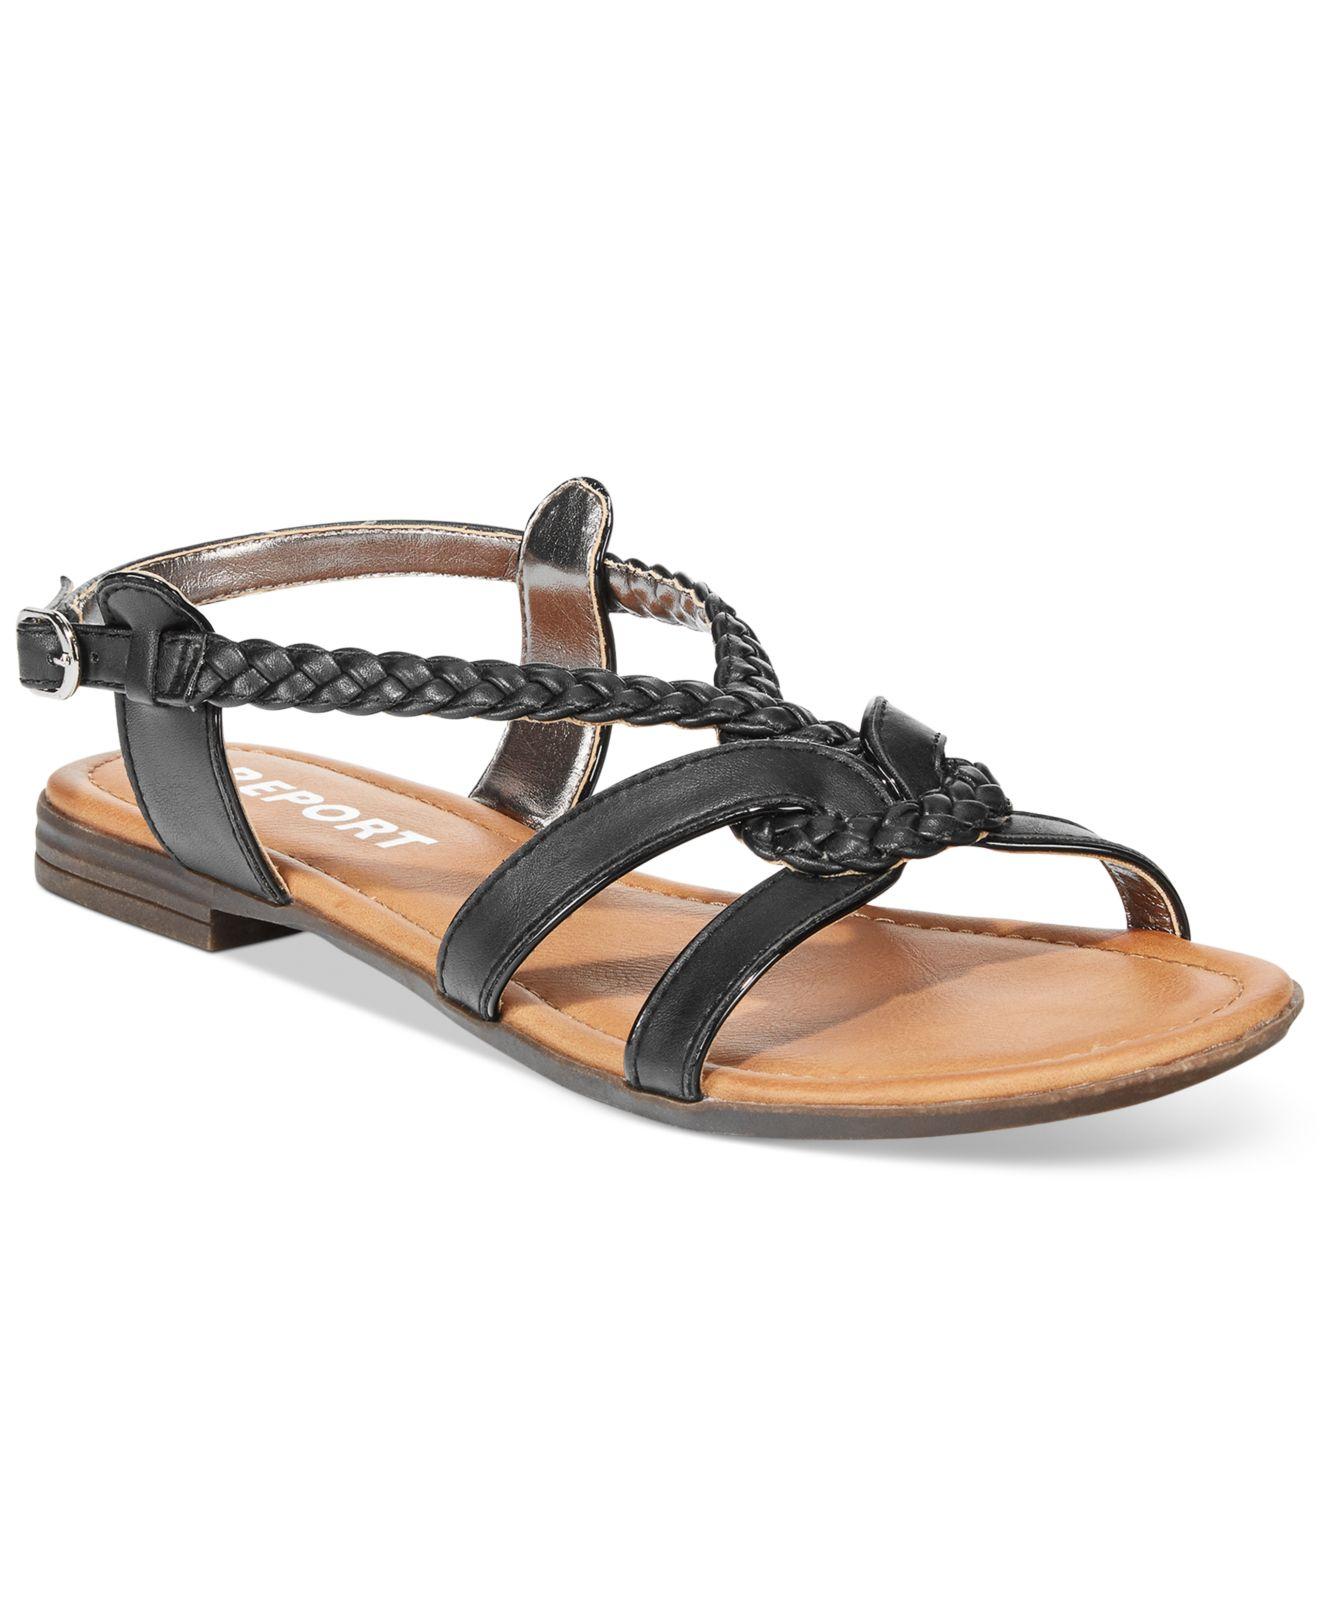 ba48d8960212b3 Lyst - Report Graden Flat Sandals in Black